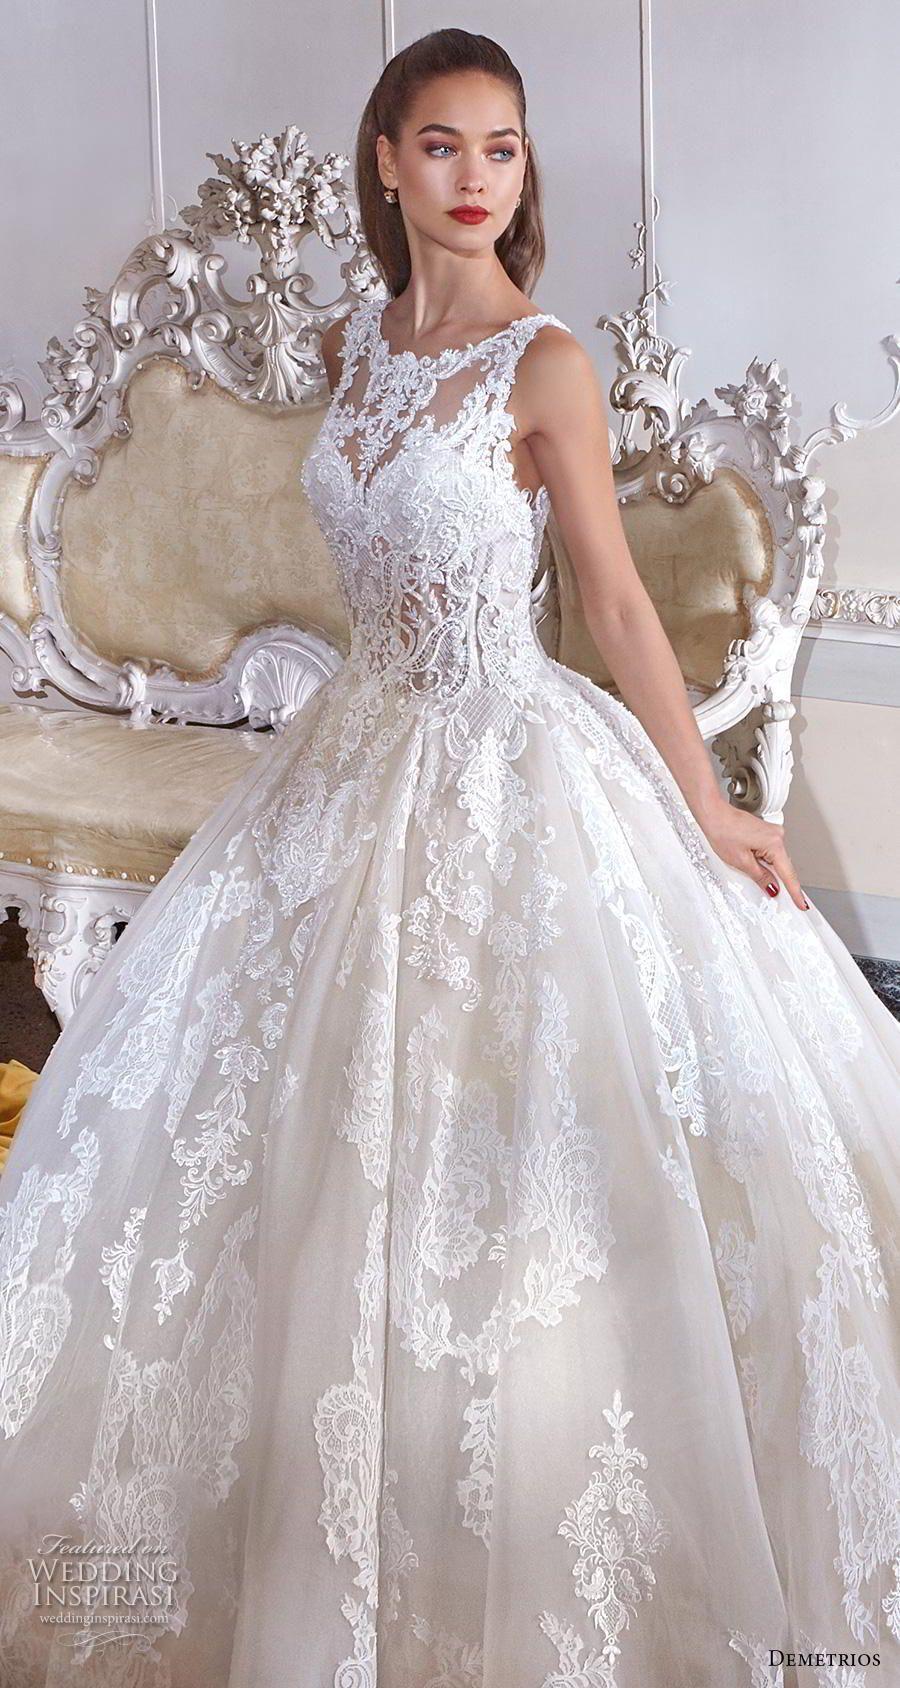 cfeeef46e6 demetrios 2019 bridal sleeveless illusion bateau sweetheart neckline full  embellishment princess ball gown a line wedding dress lace back chapel  train (7) ...